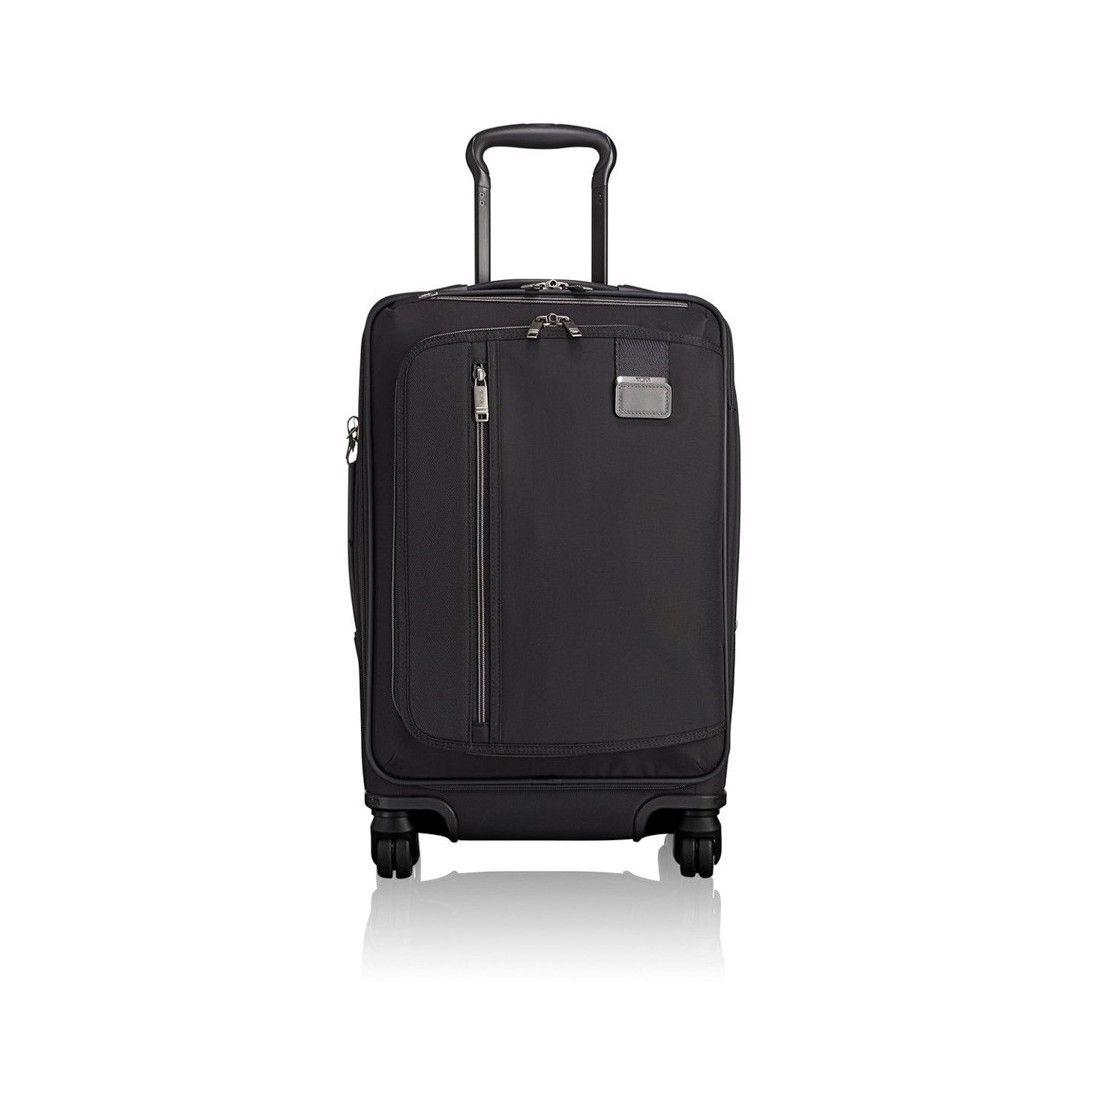 Tumi Merge maleta negra maleta blanda maleta spinner